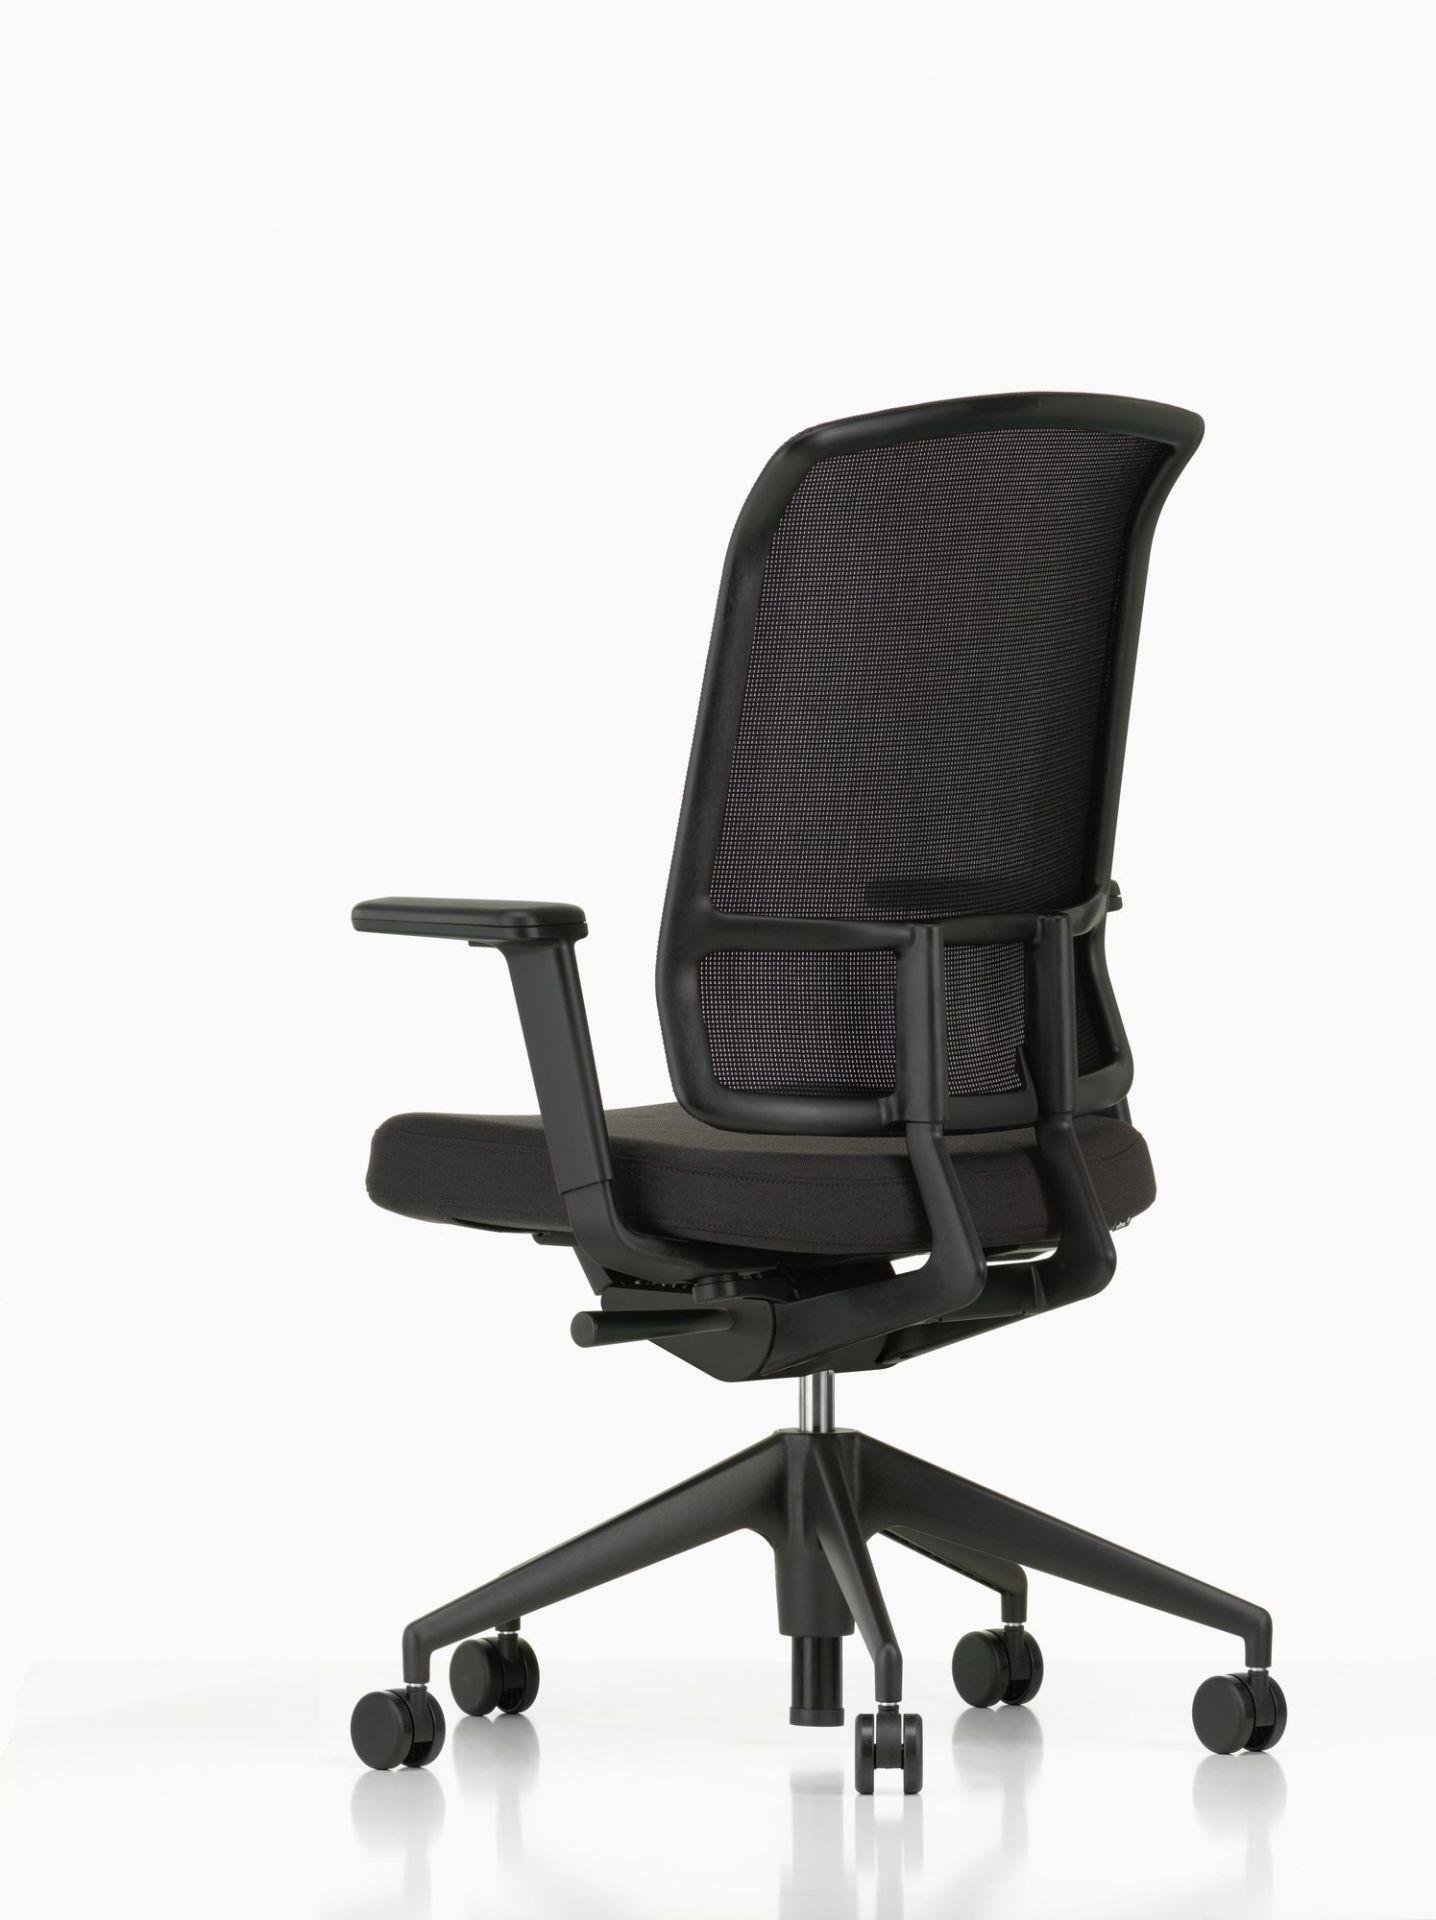 AM Chair Drehstuhl von Vitra Aktionsmodell